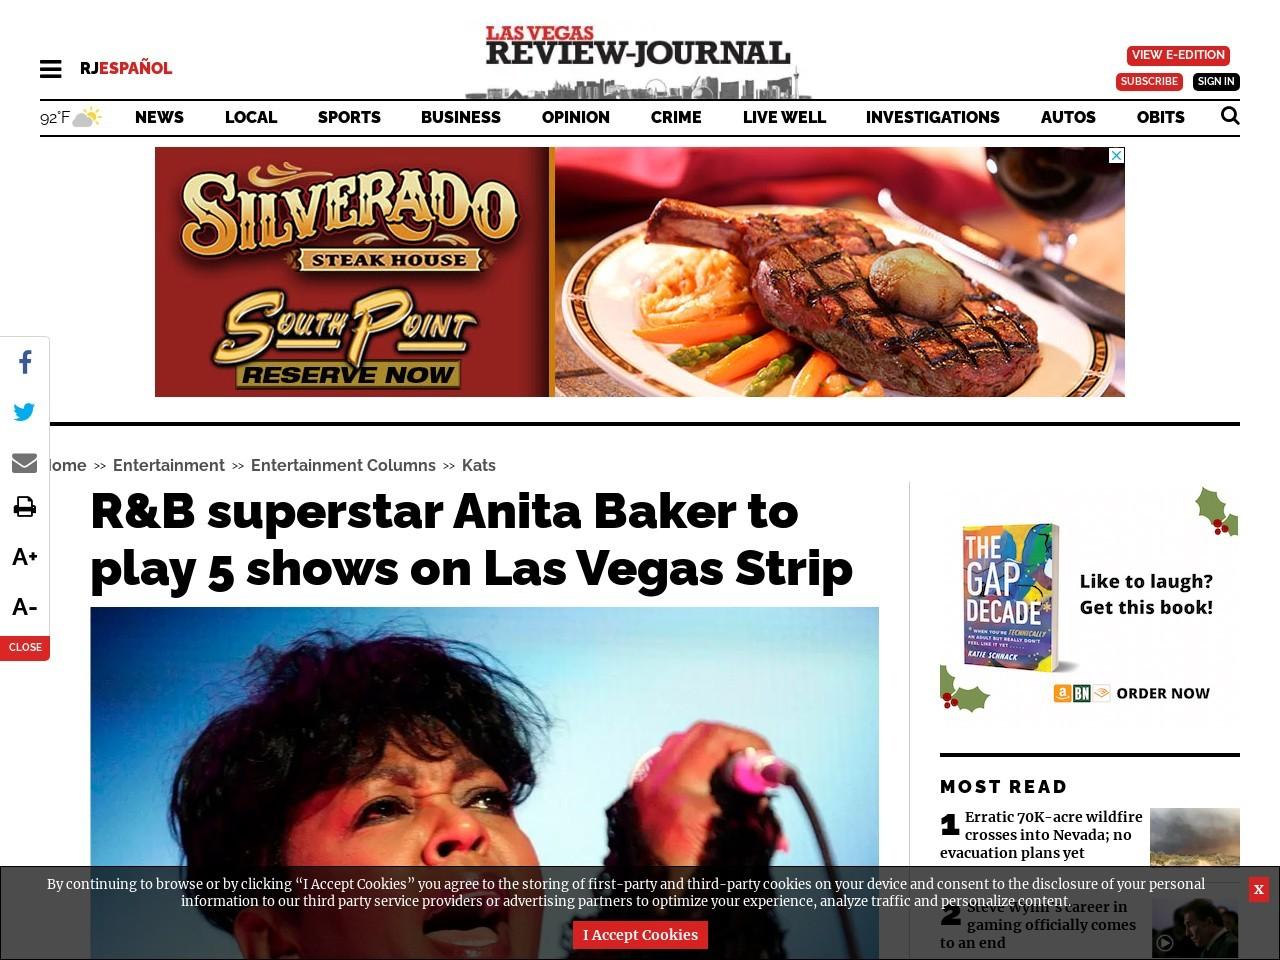 R&B superstar Anita Baker to play 5 shows on Las Vegas Strip